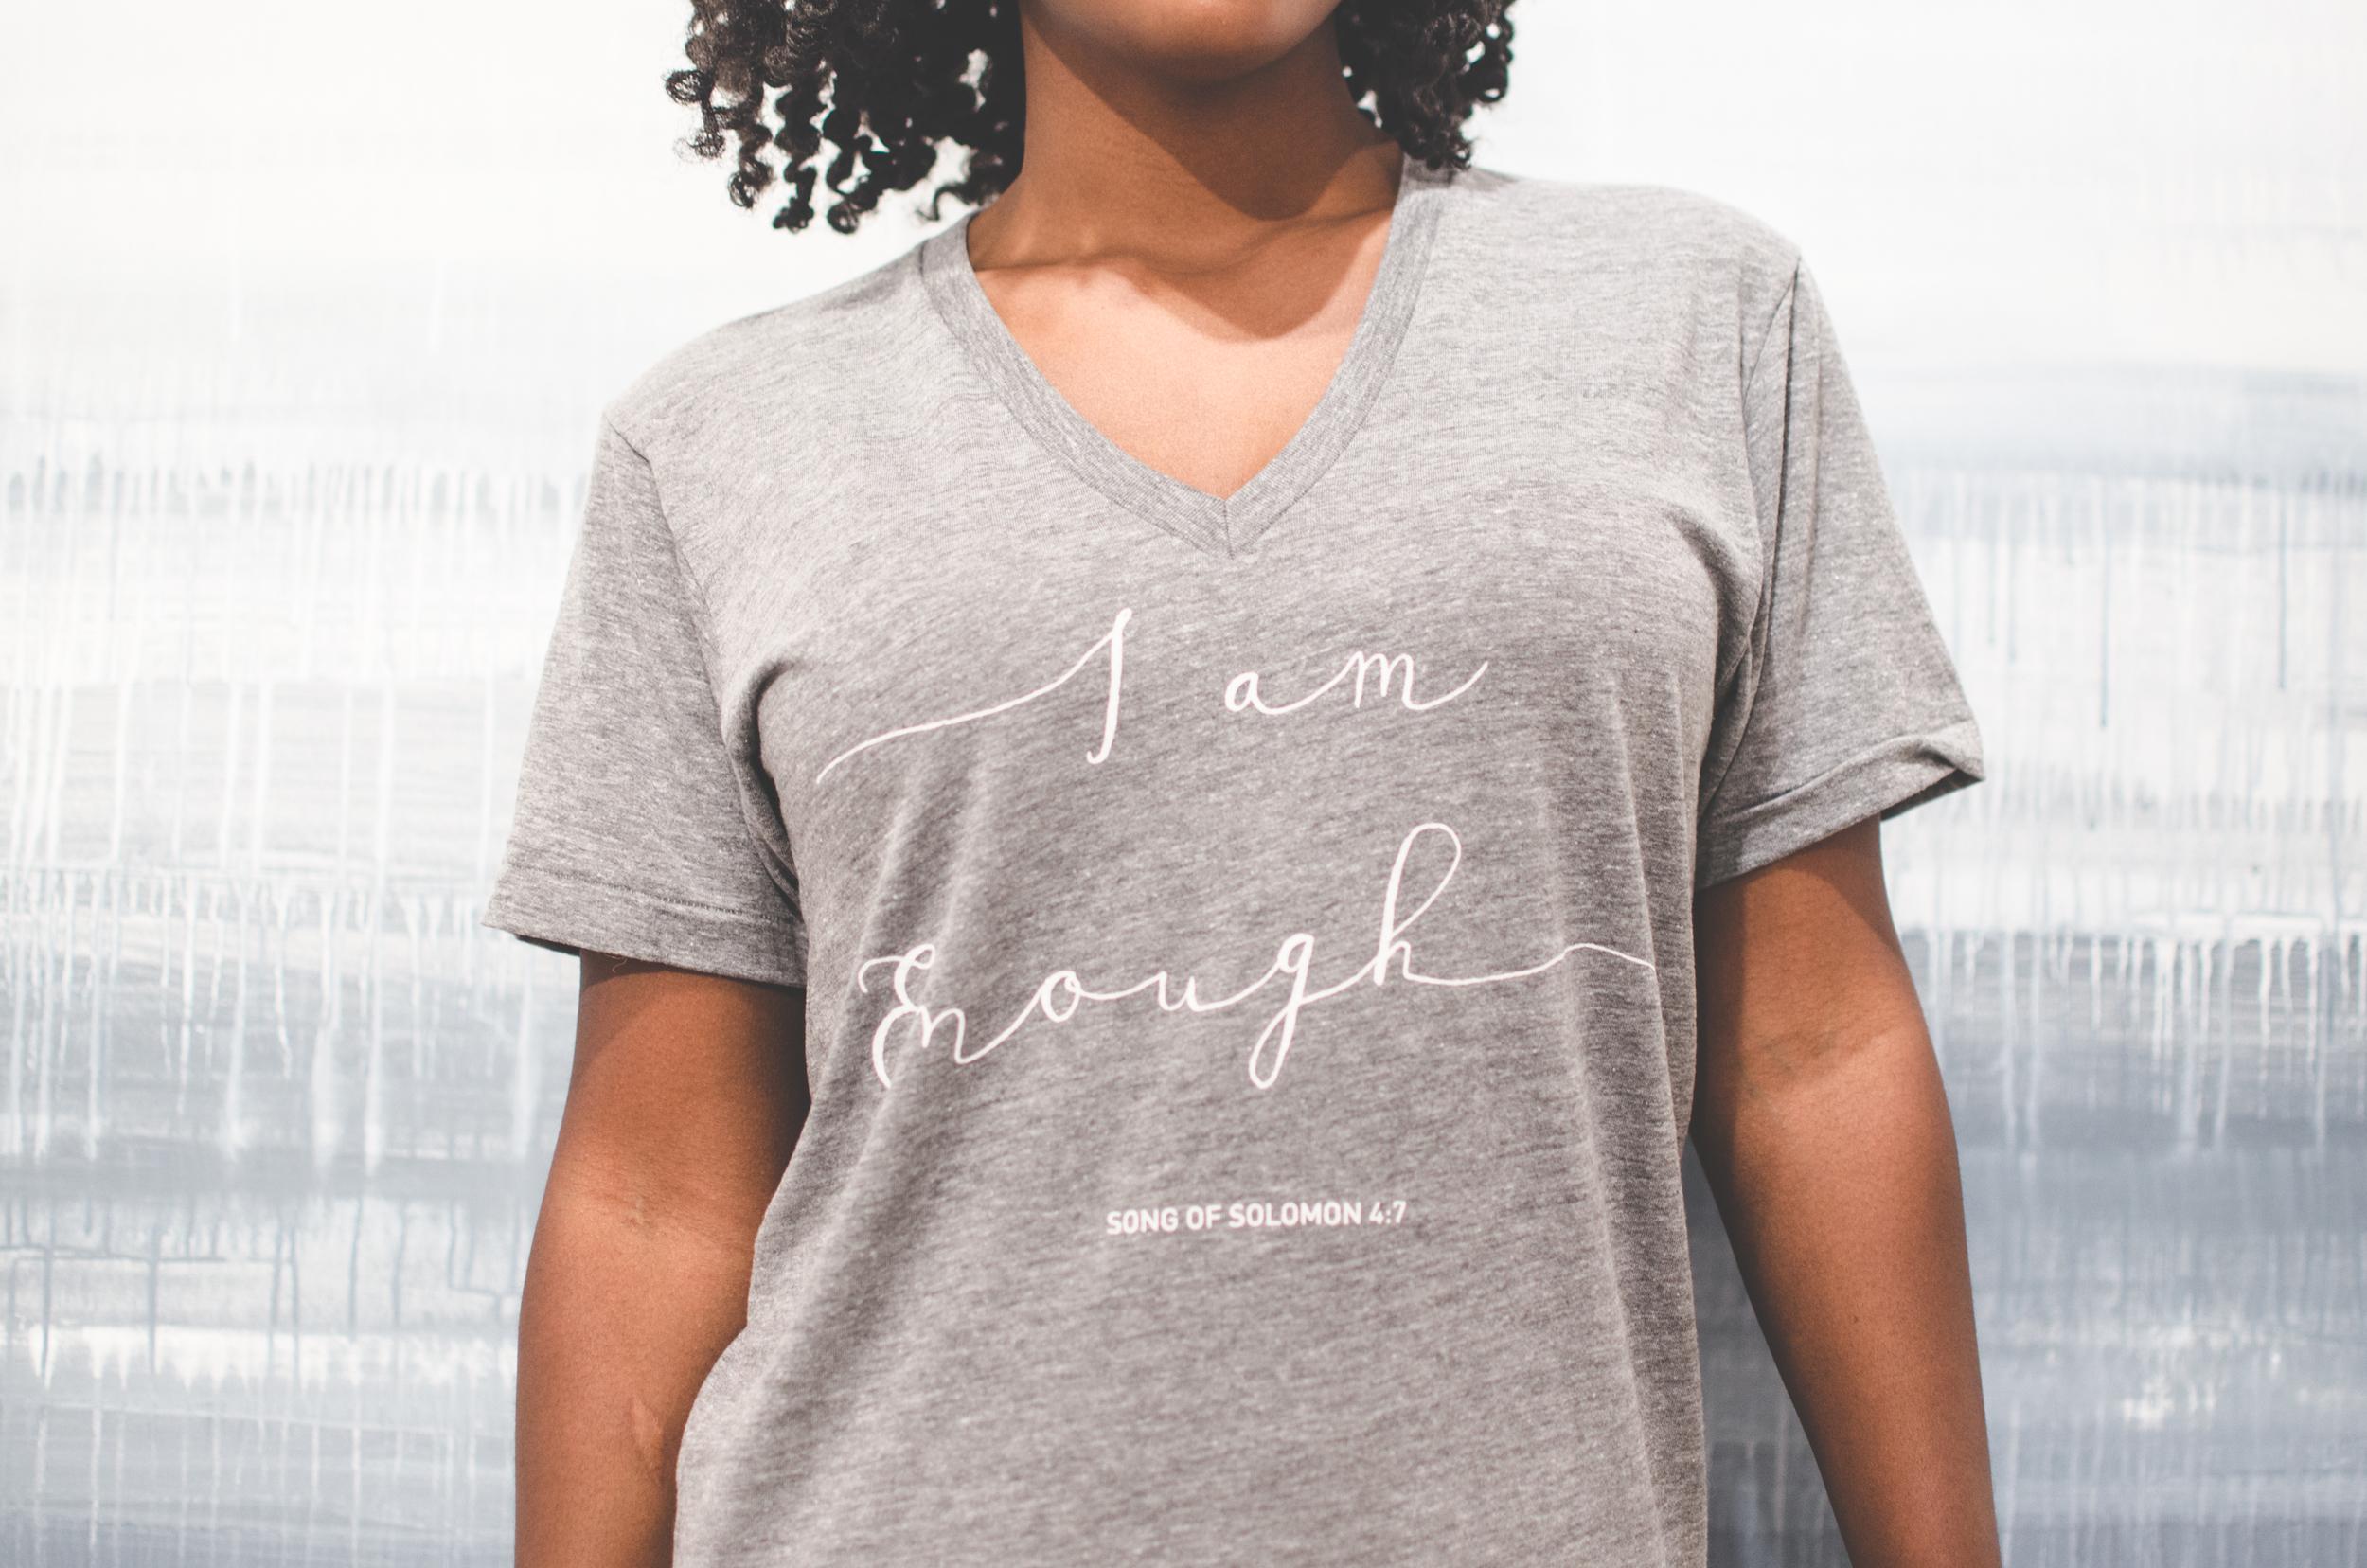 I AM Enough Tee from HazlenutBlue Clothing  Photographer Oscar Lozada of Dallas, Texas